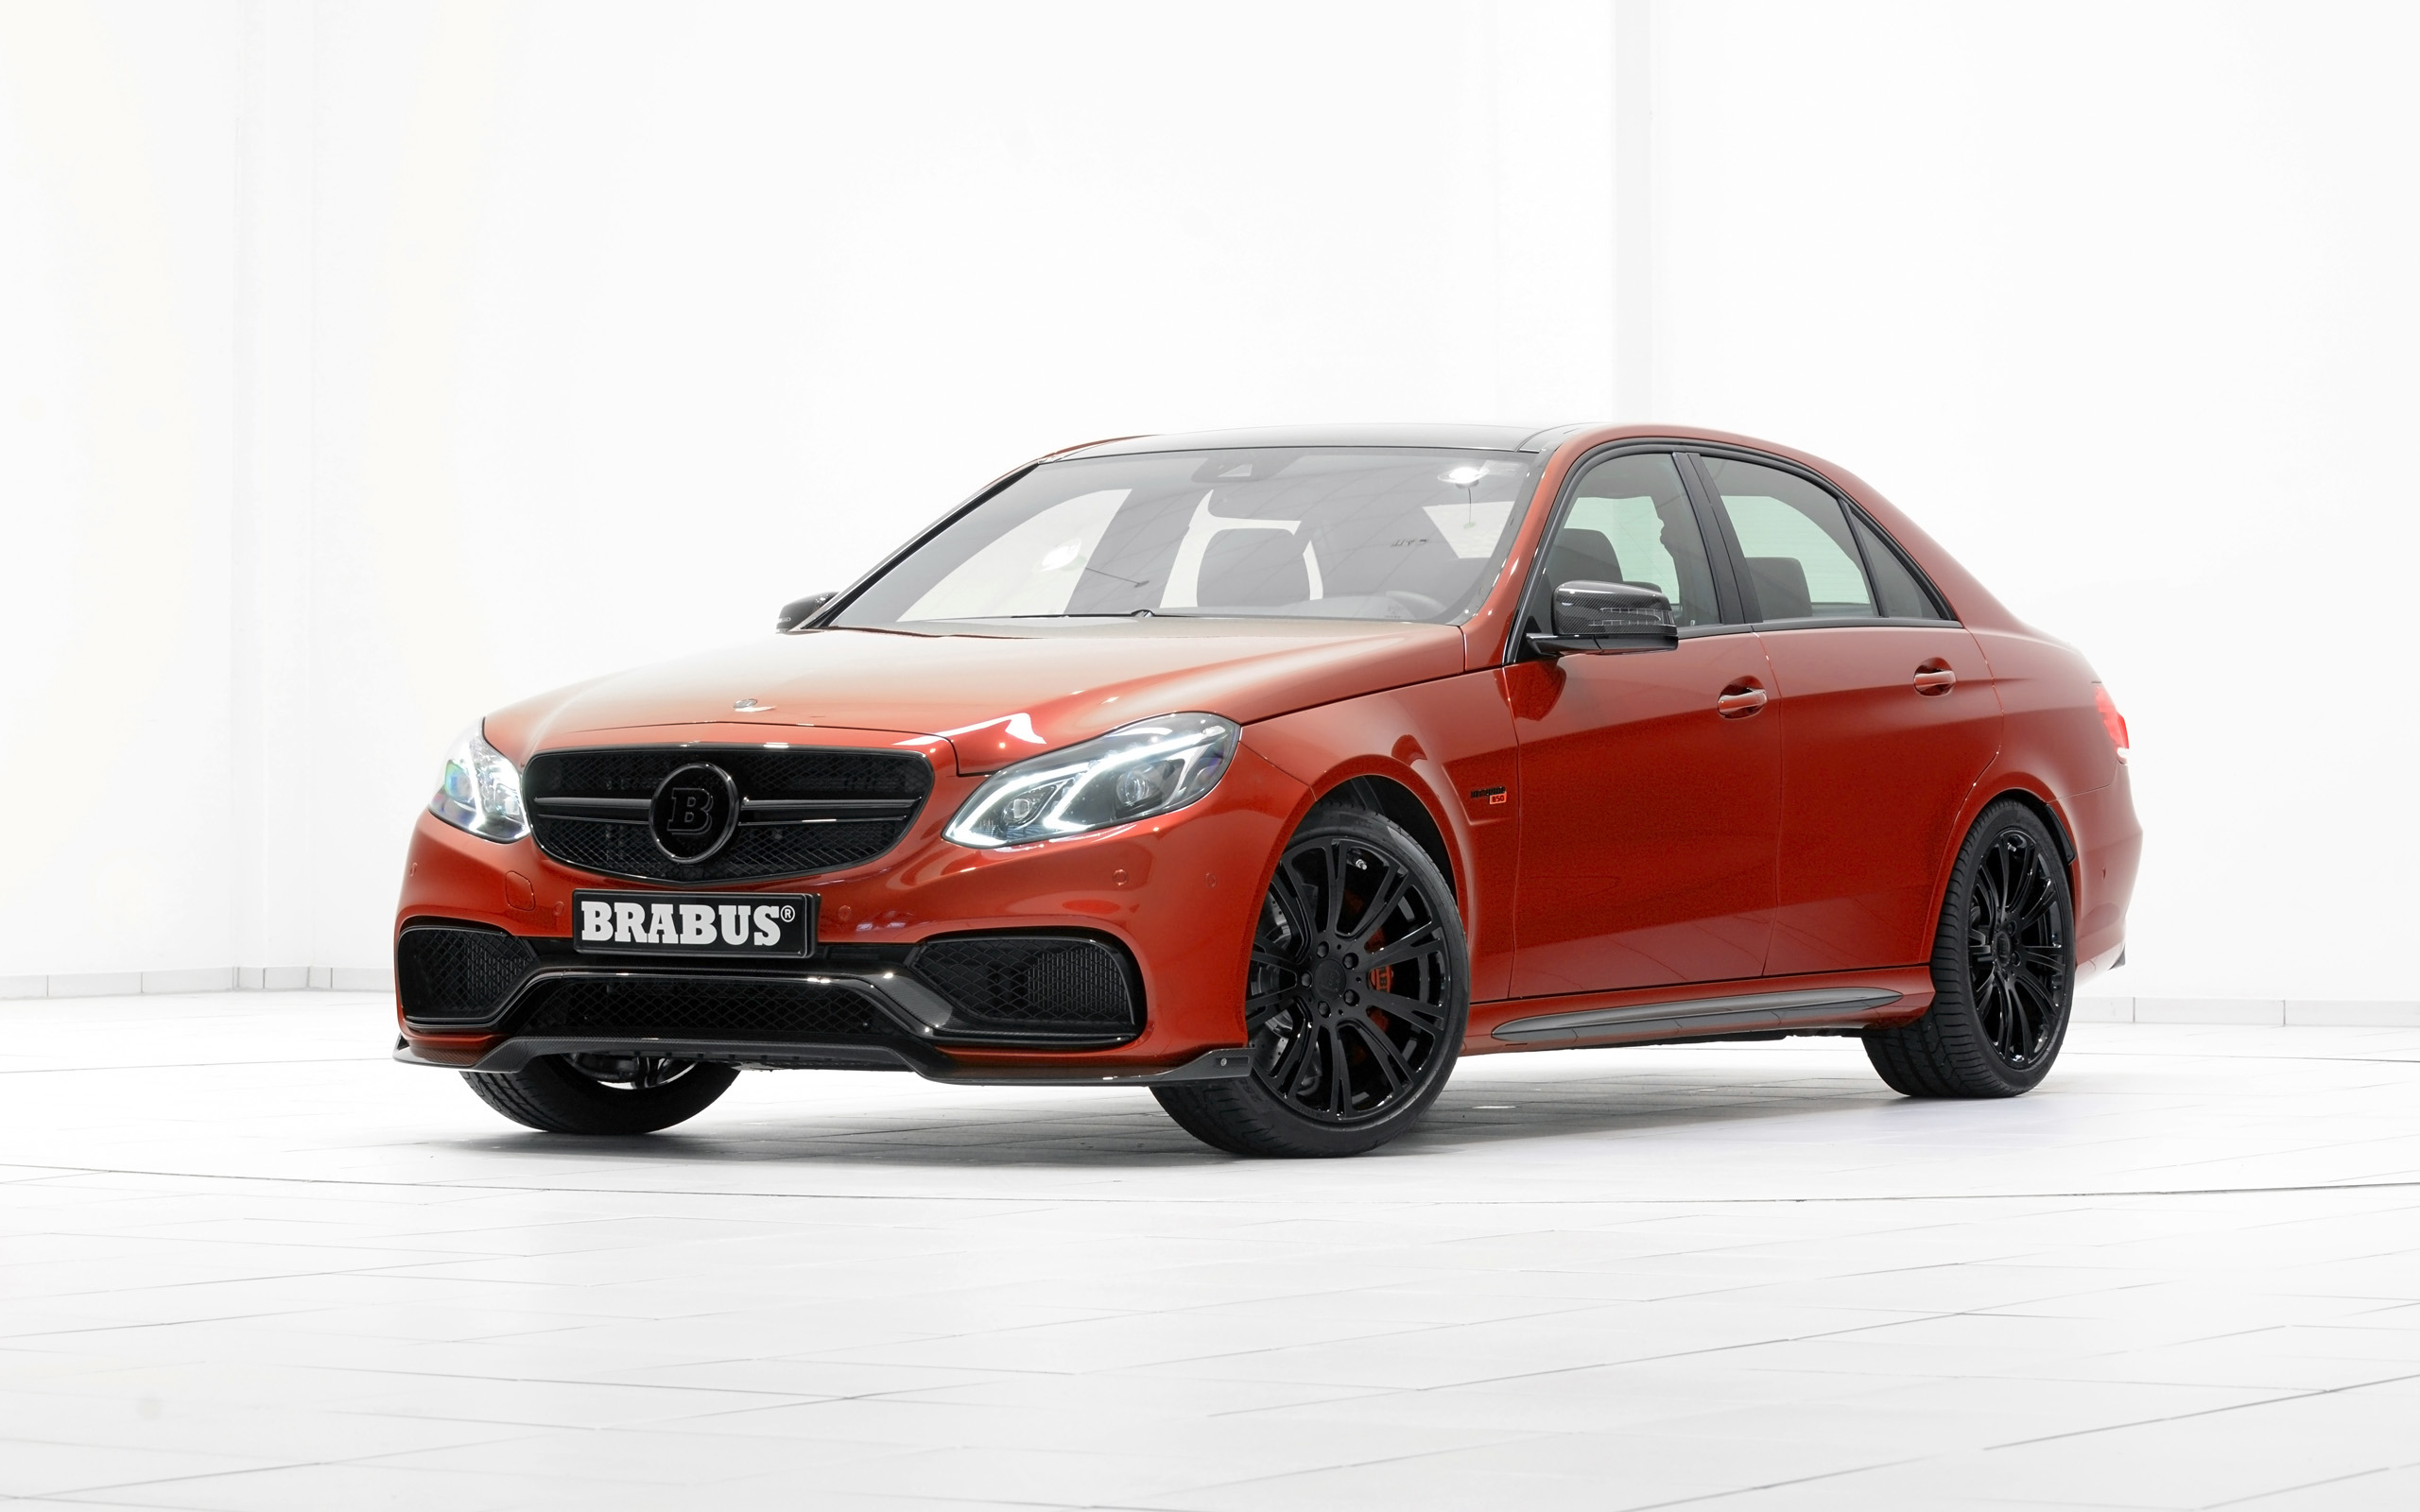 2014 brabus mercedes benz e 63 850 biturbo red wallpaper for Mercedes benz 850